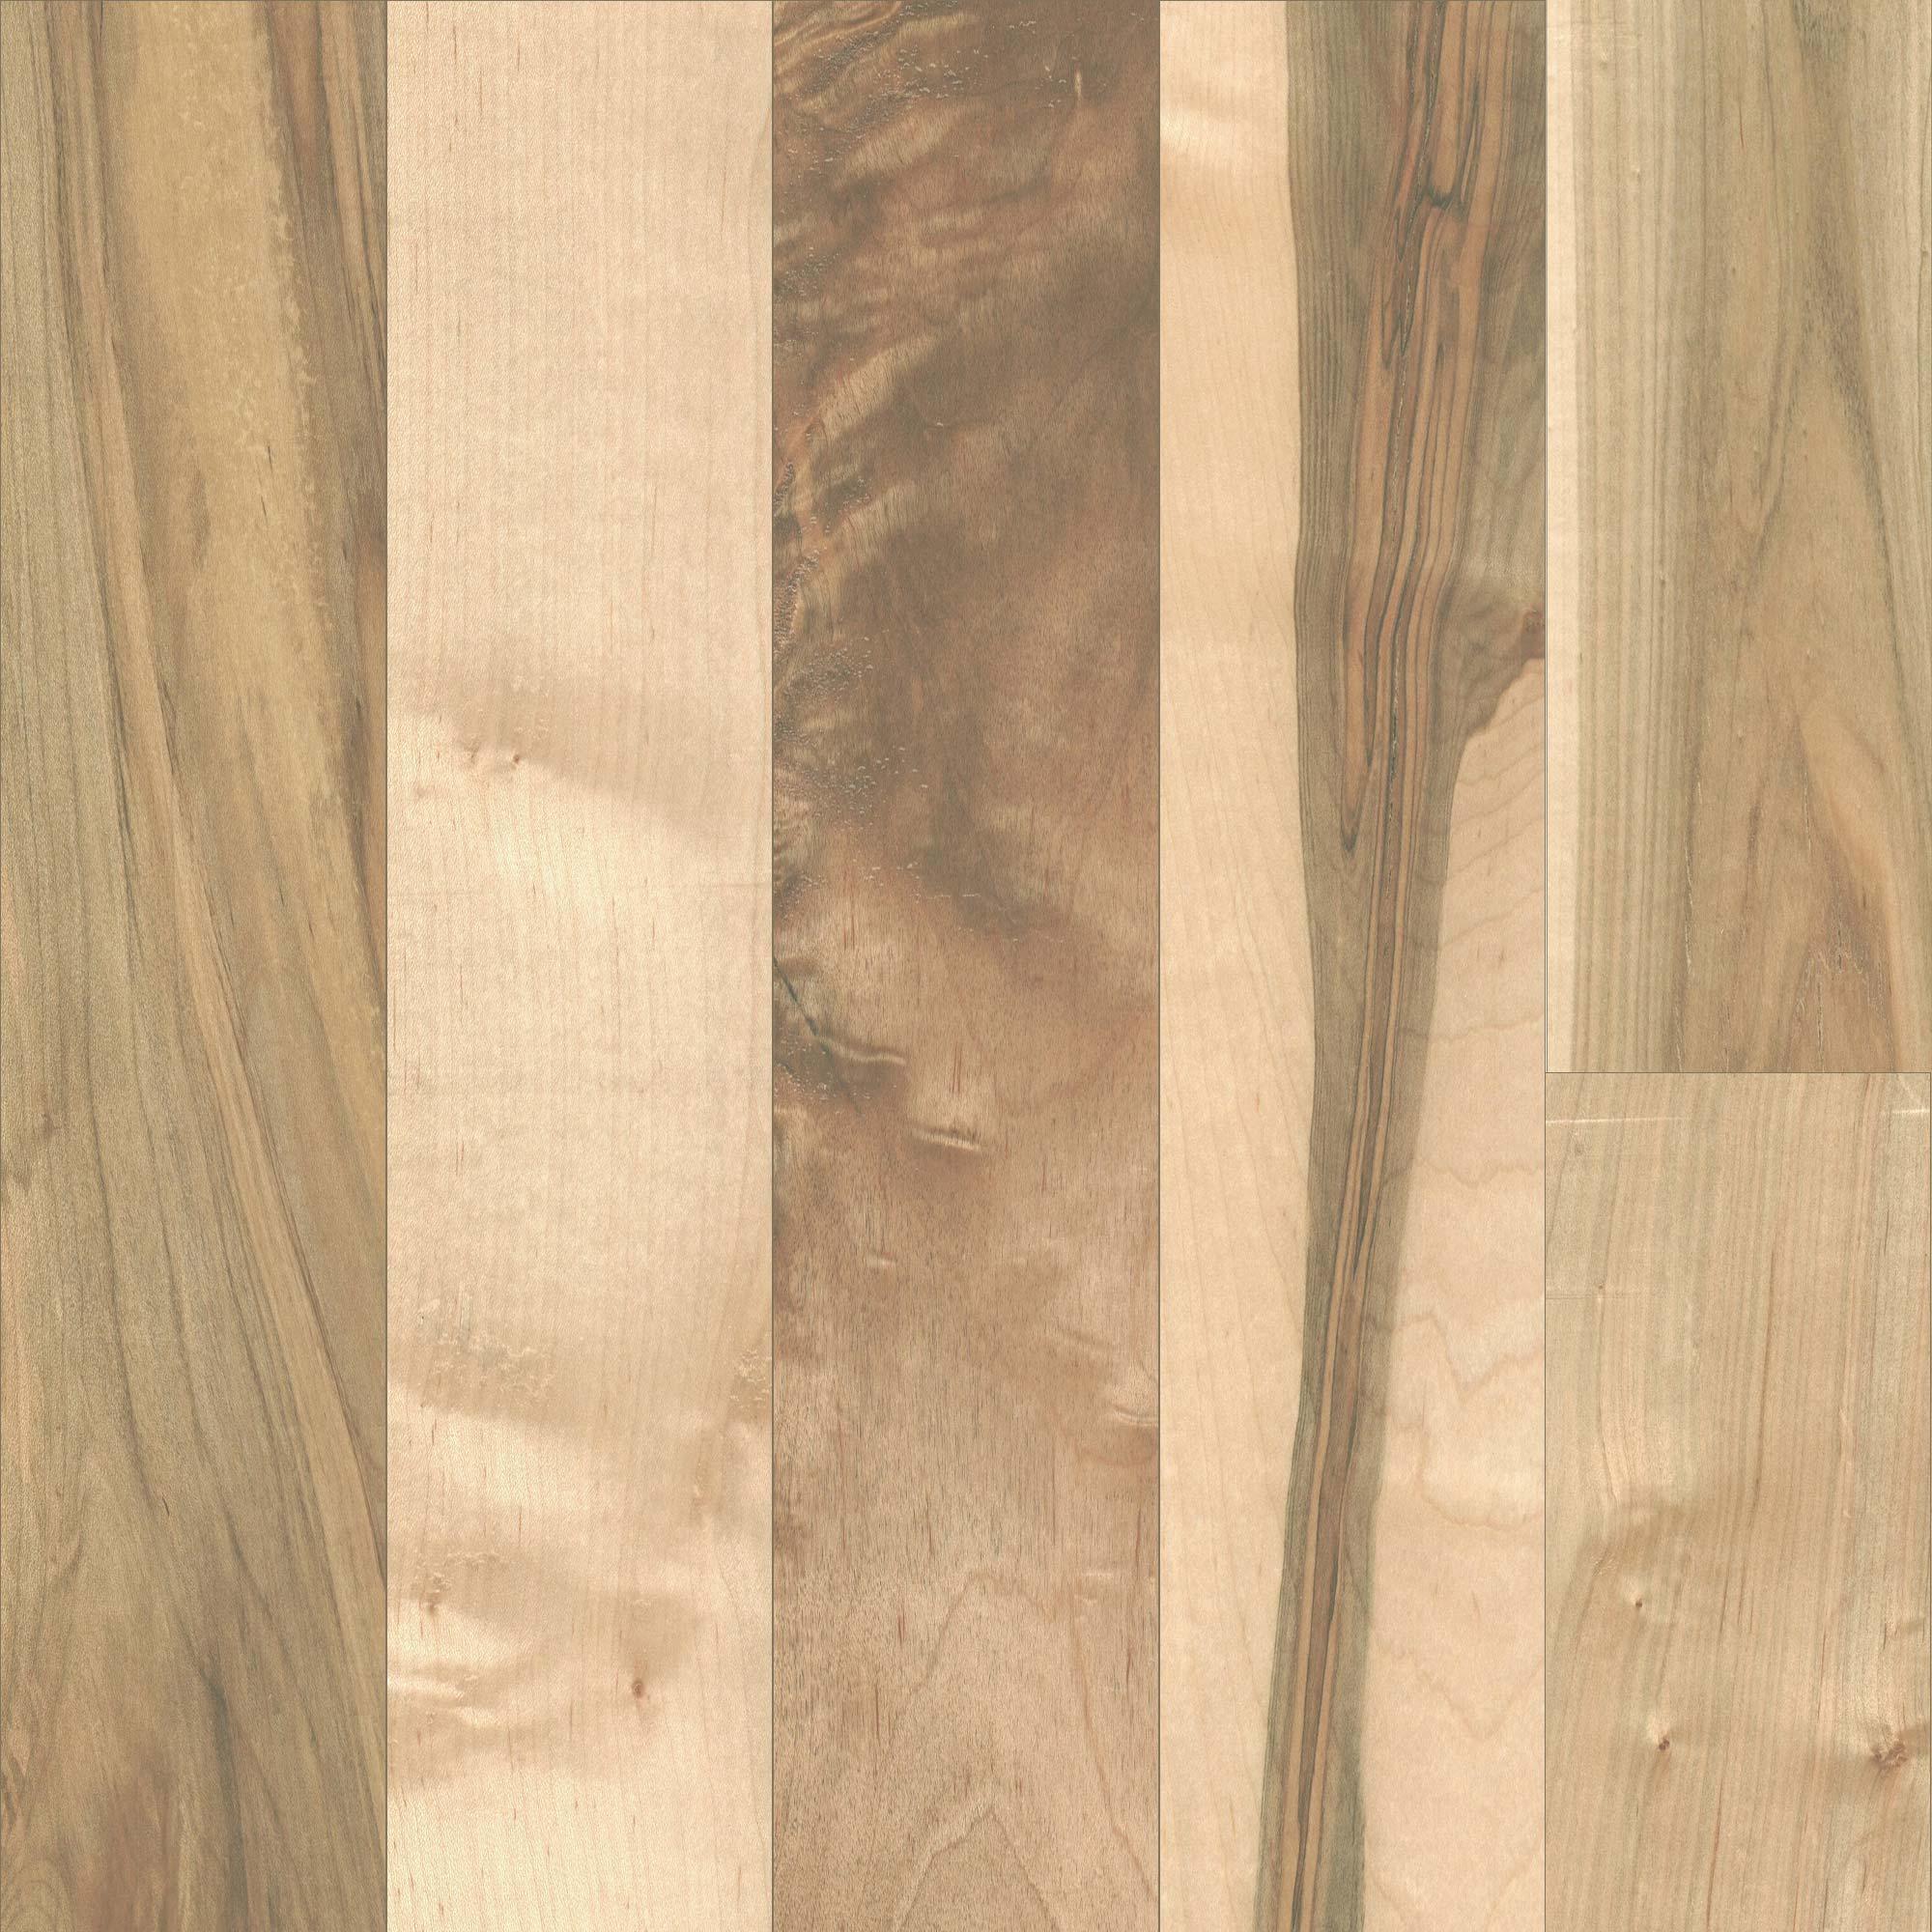 3 4 inch oak hardwood flooring of kingsmill natural maple 4 wide 3 4 solid hardwood flooring for natural maple m unat4 4 x 36 approved